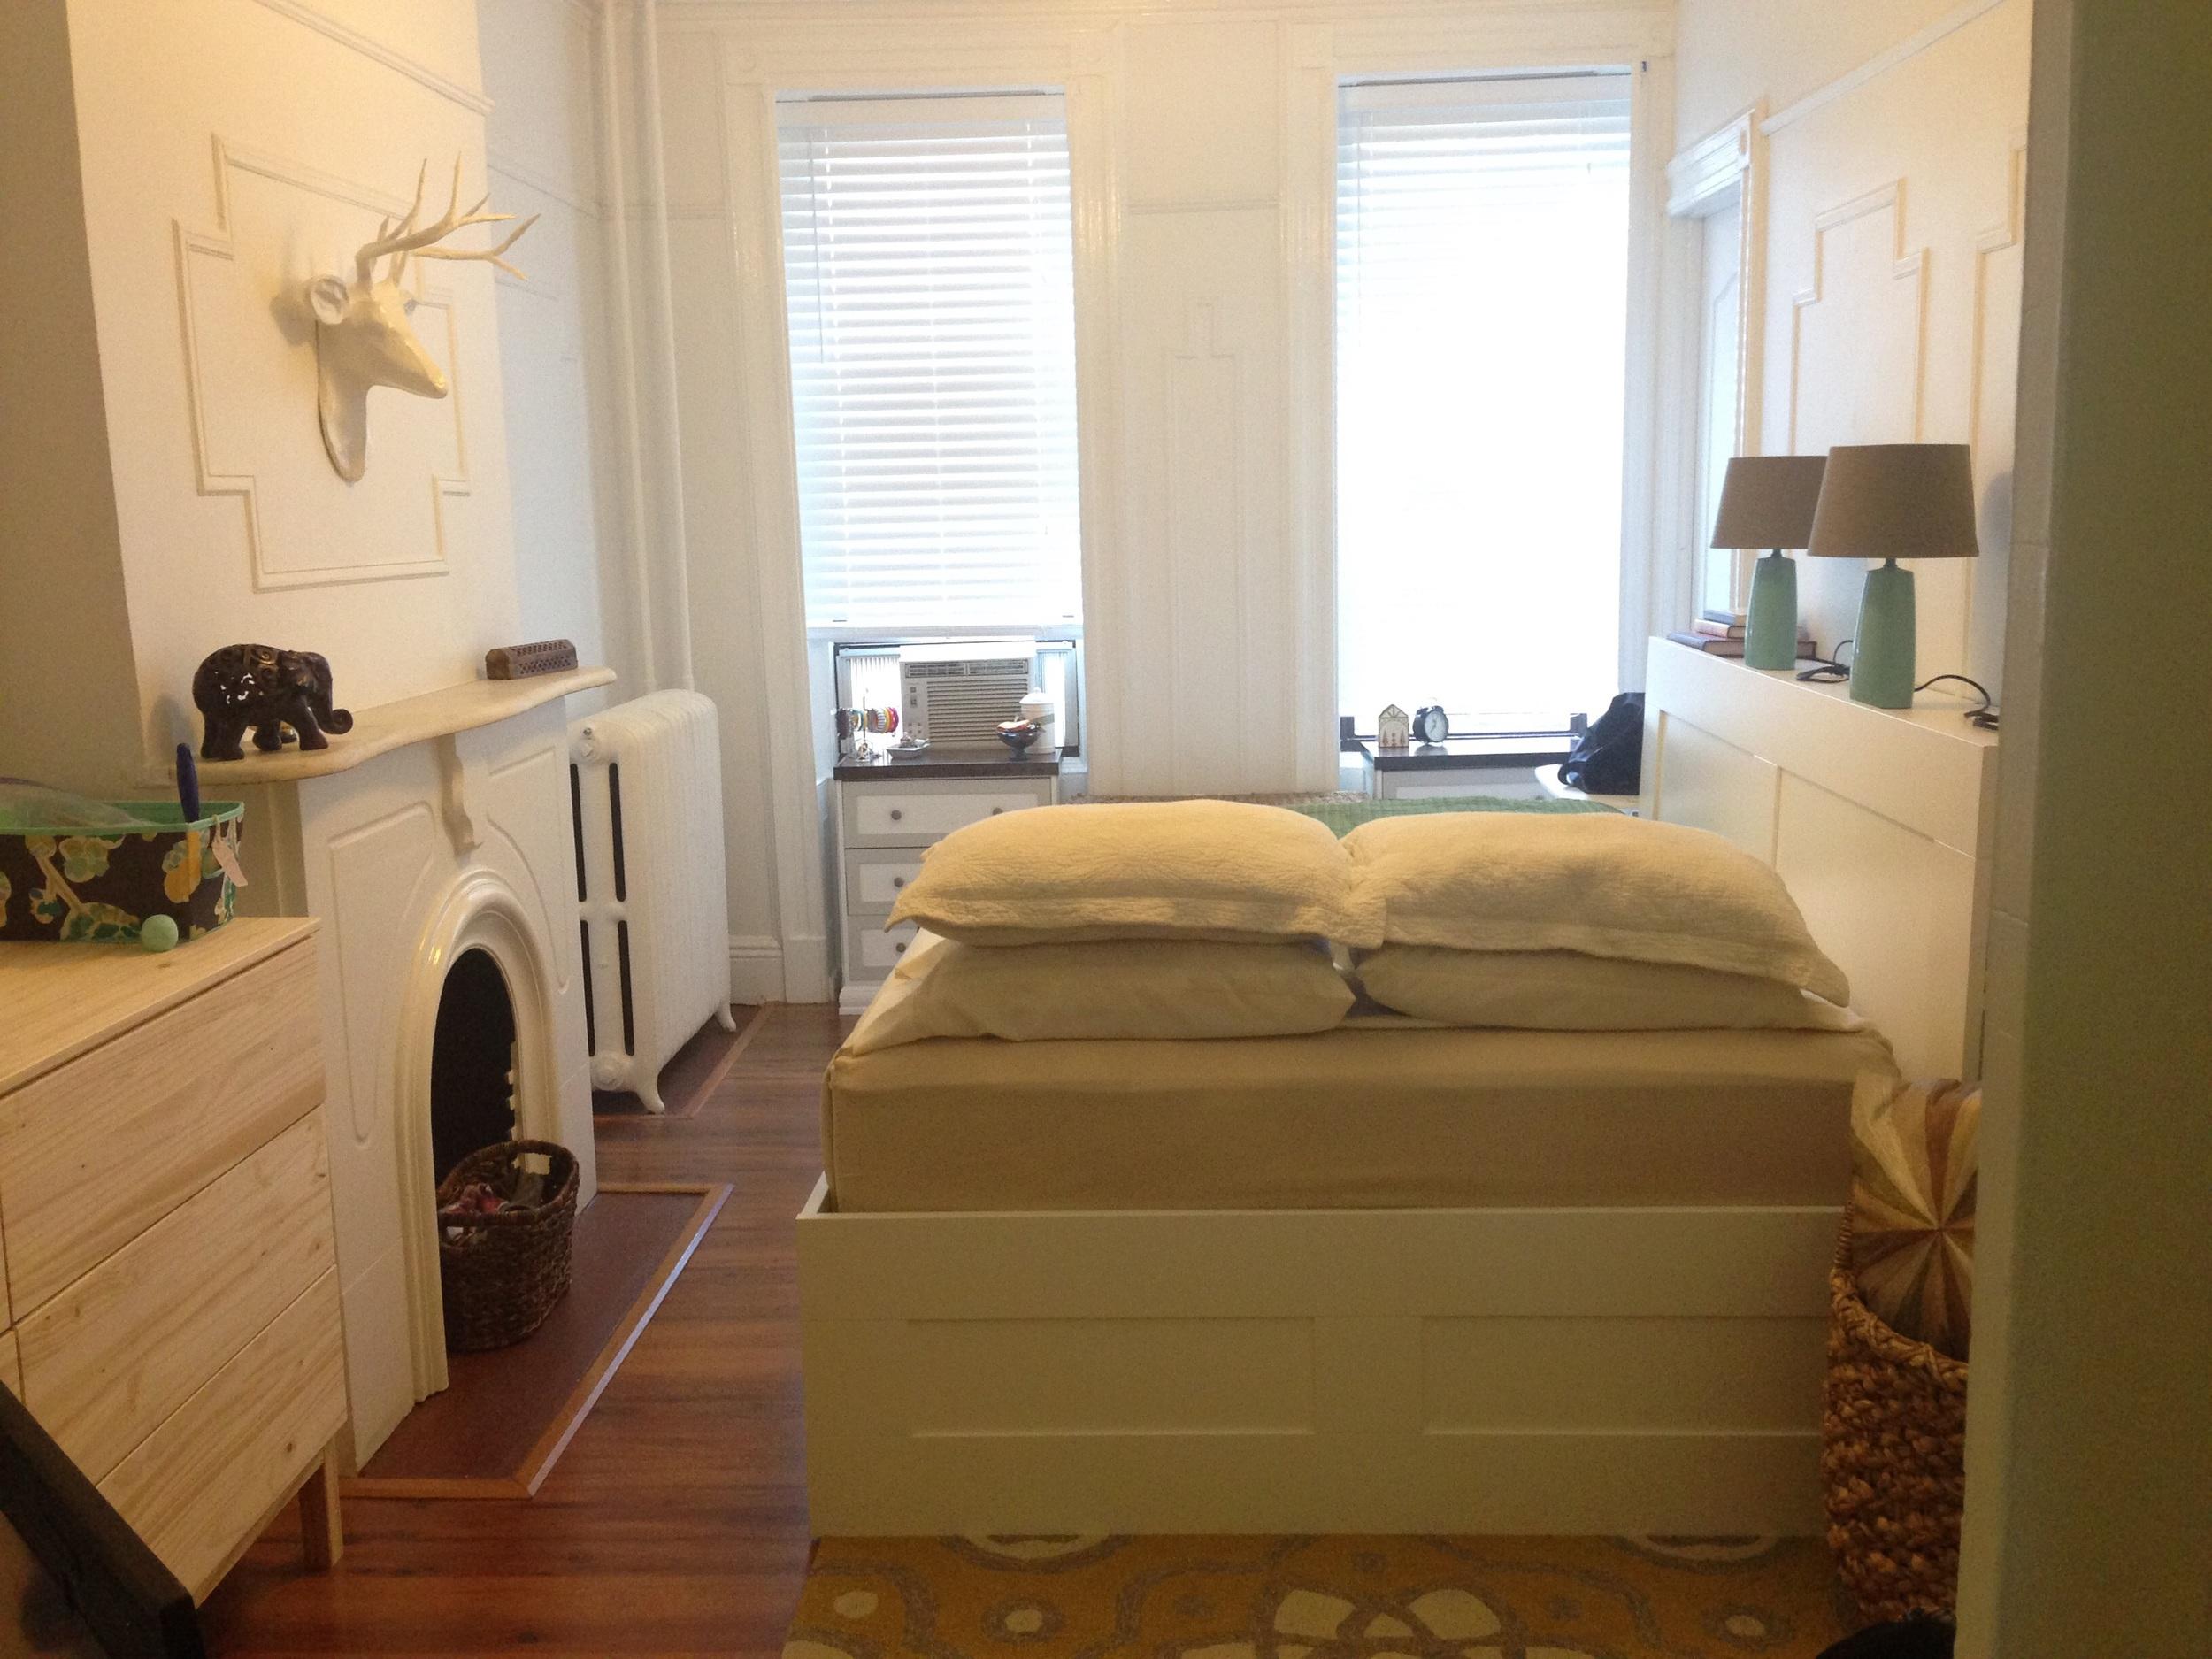 Current state of master bedroom (ignore the unfinished dresser on left side).